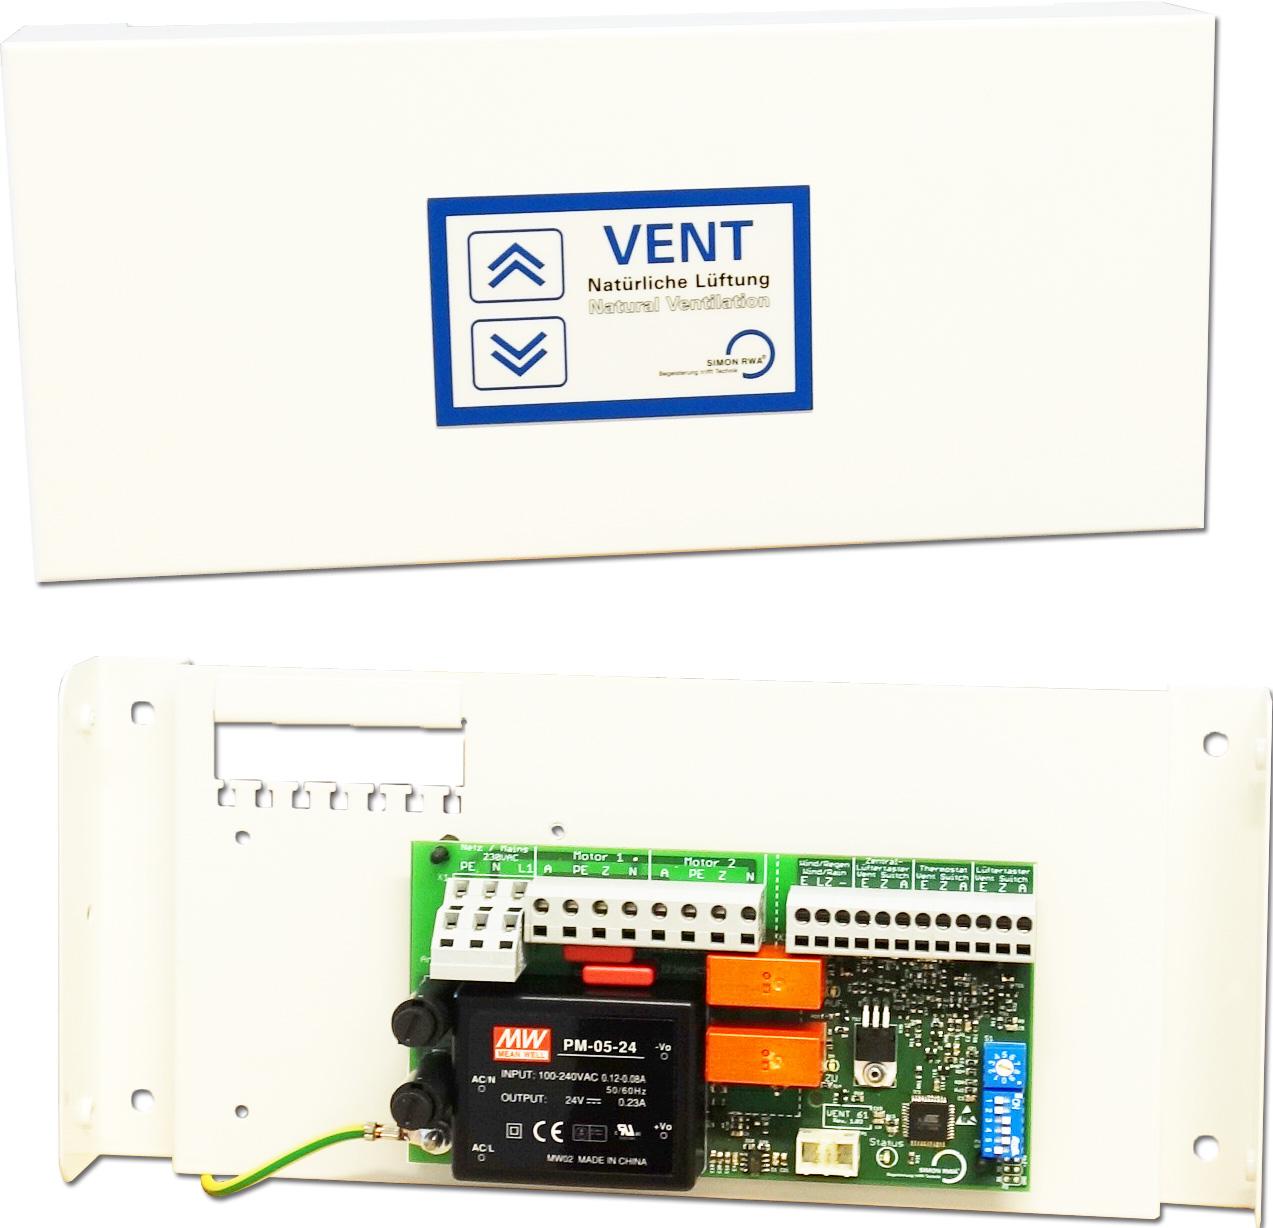 Compact control unit VENT-61-AP